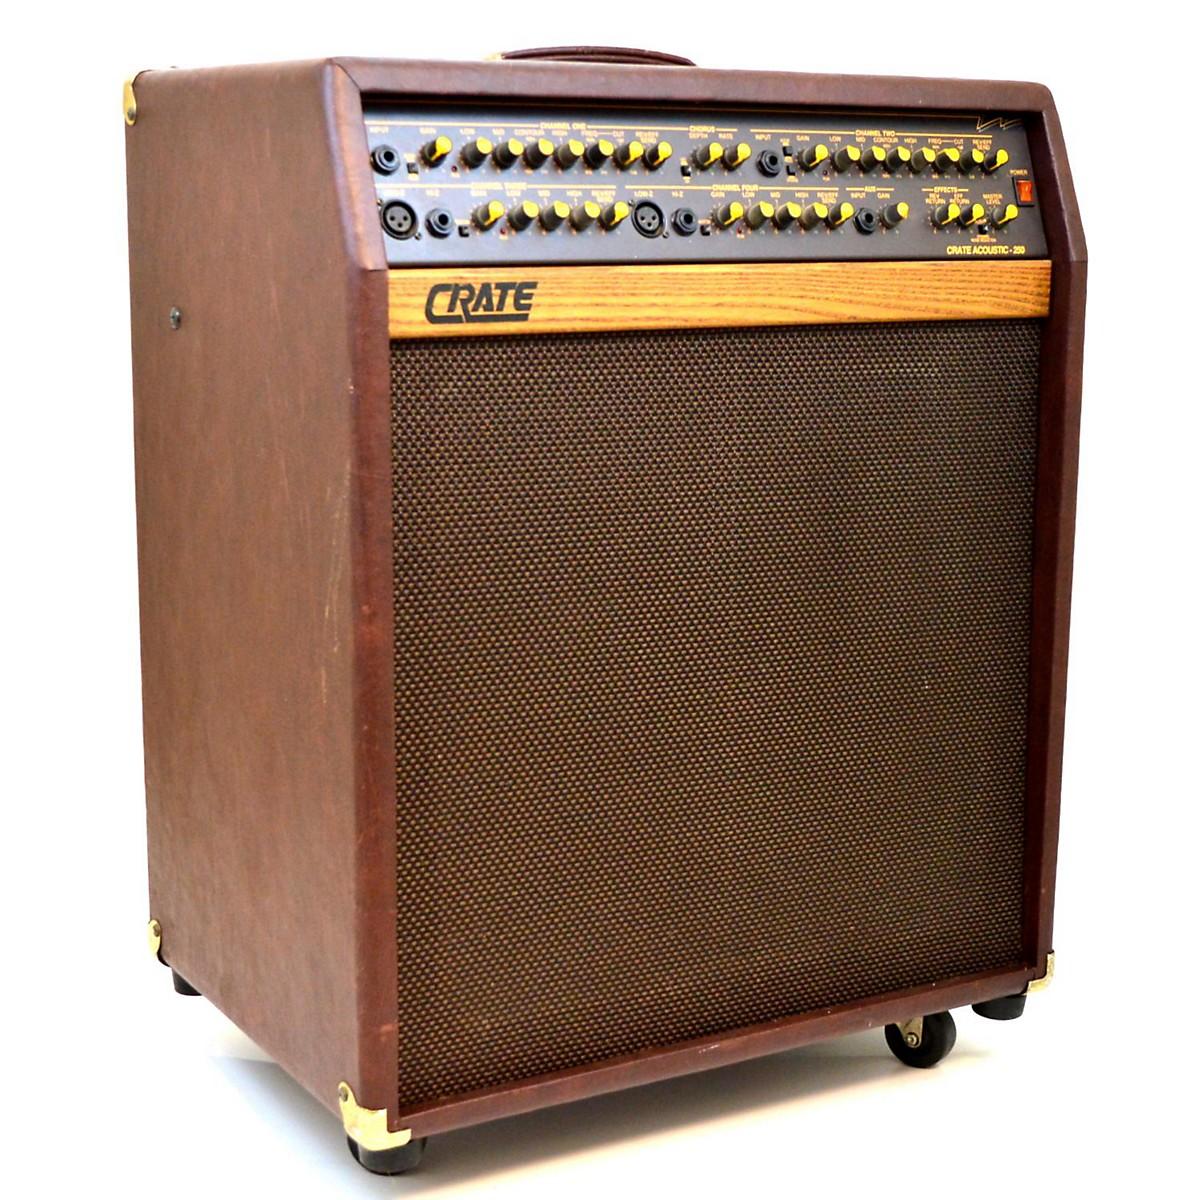 Crate CA250 Bass Combo Amp